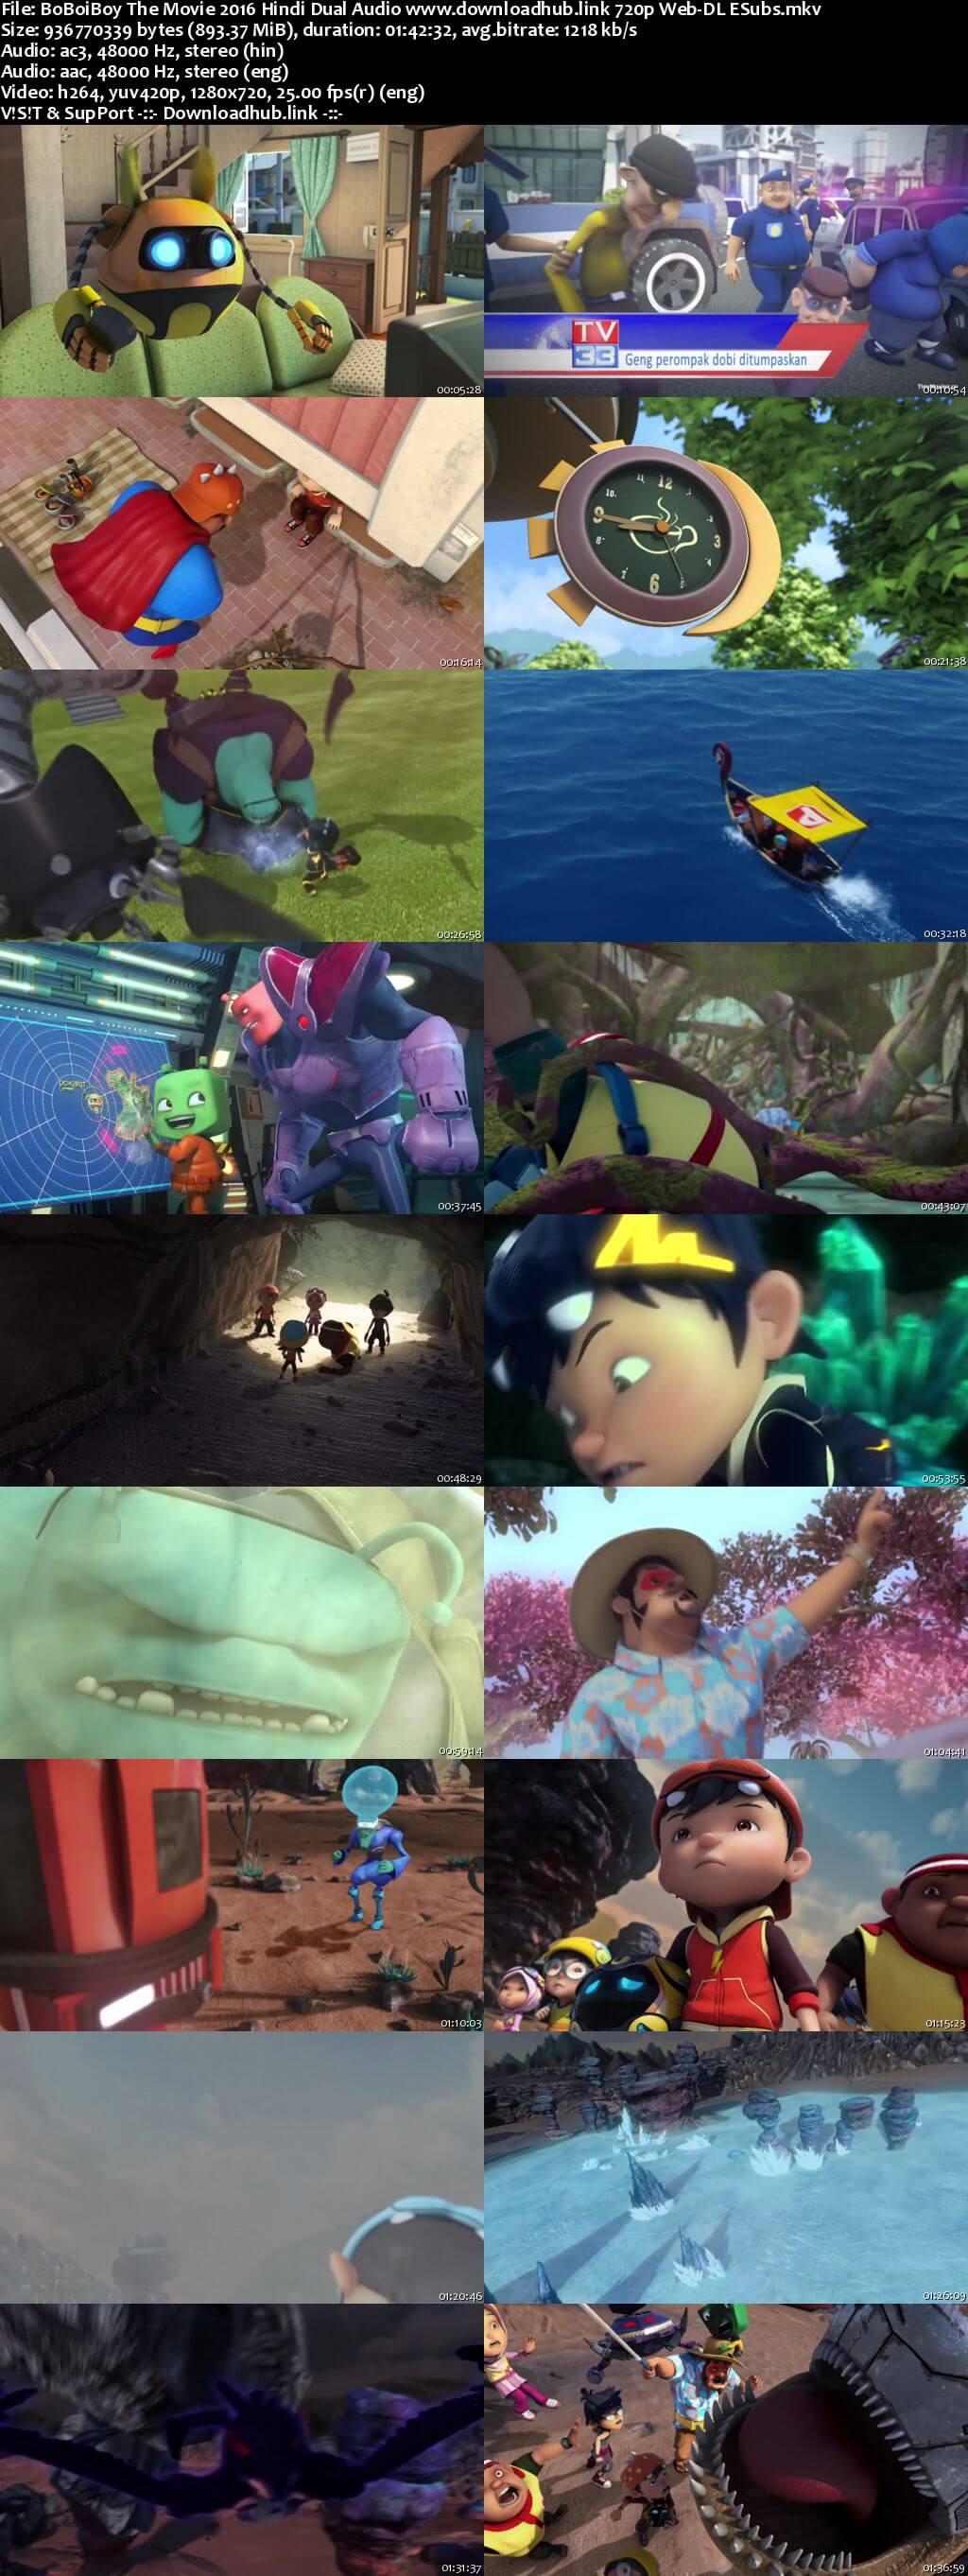 BoBoiBoy The Movie 2016 Hindi Dual Audio 720p Web-DL ESubs